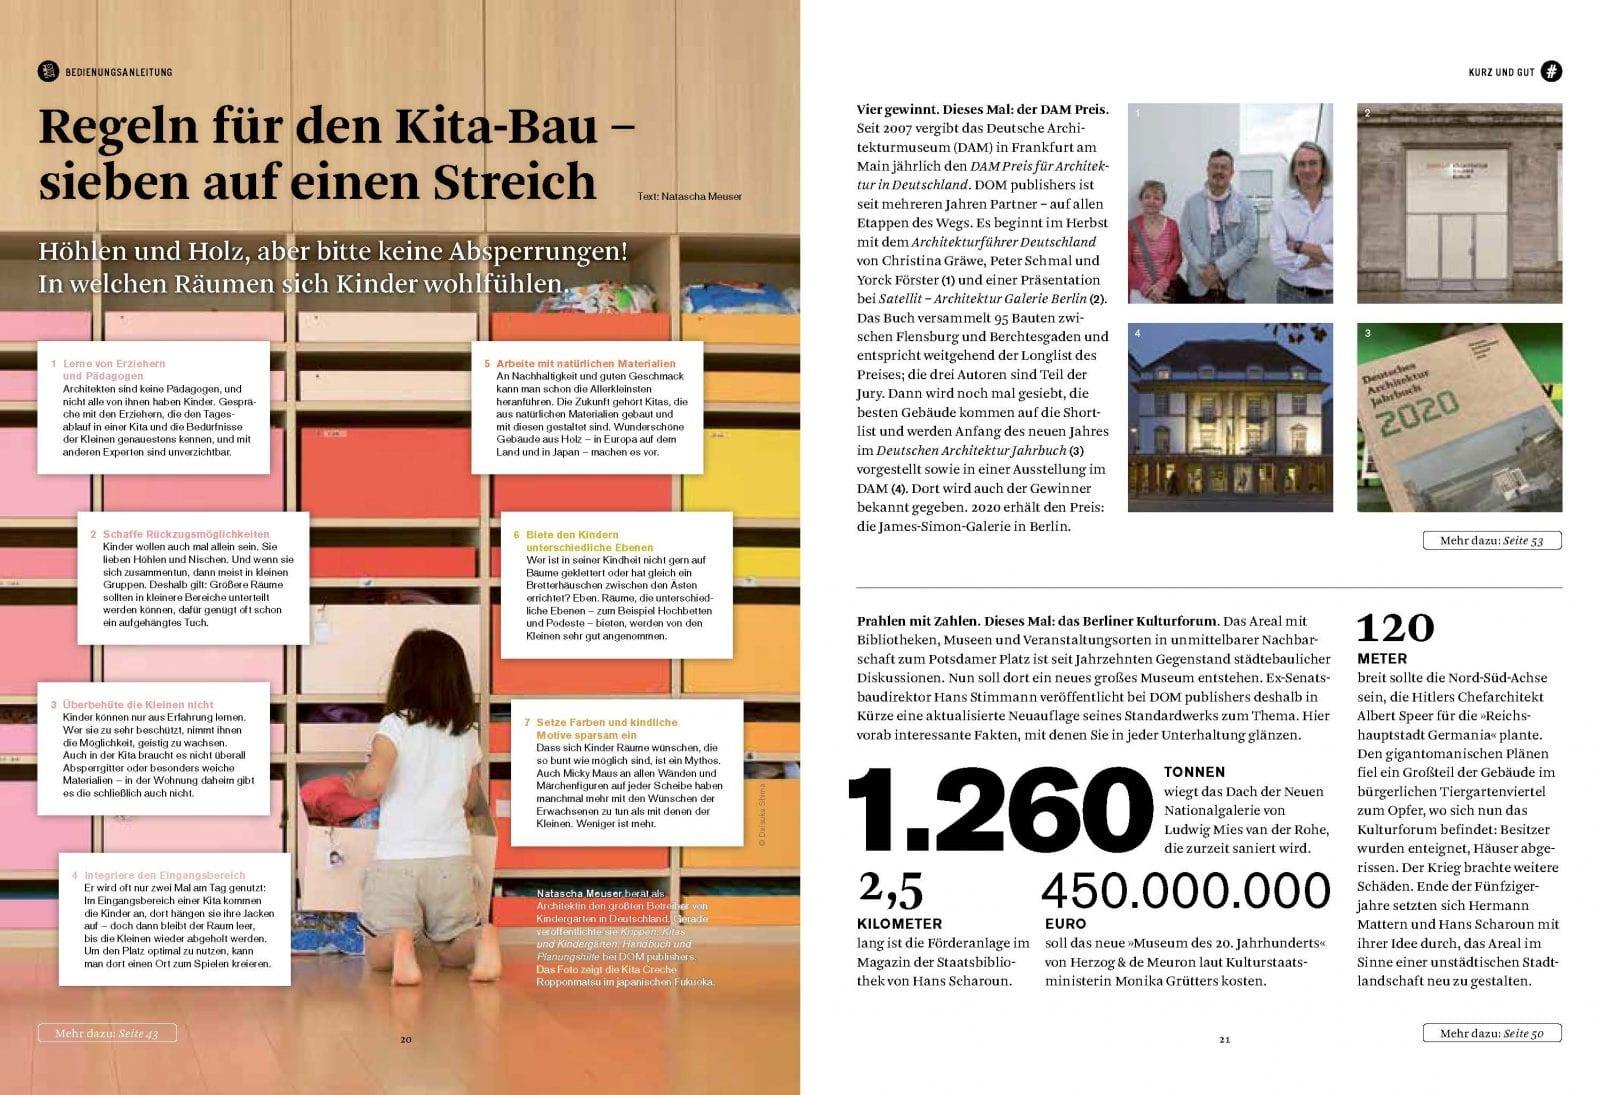 DOM magazine 01/2020, Seiten 20/21 (Bild: DOM publishers)